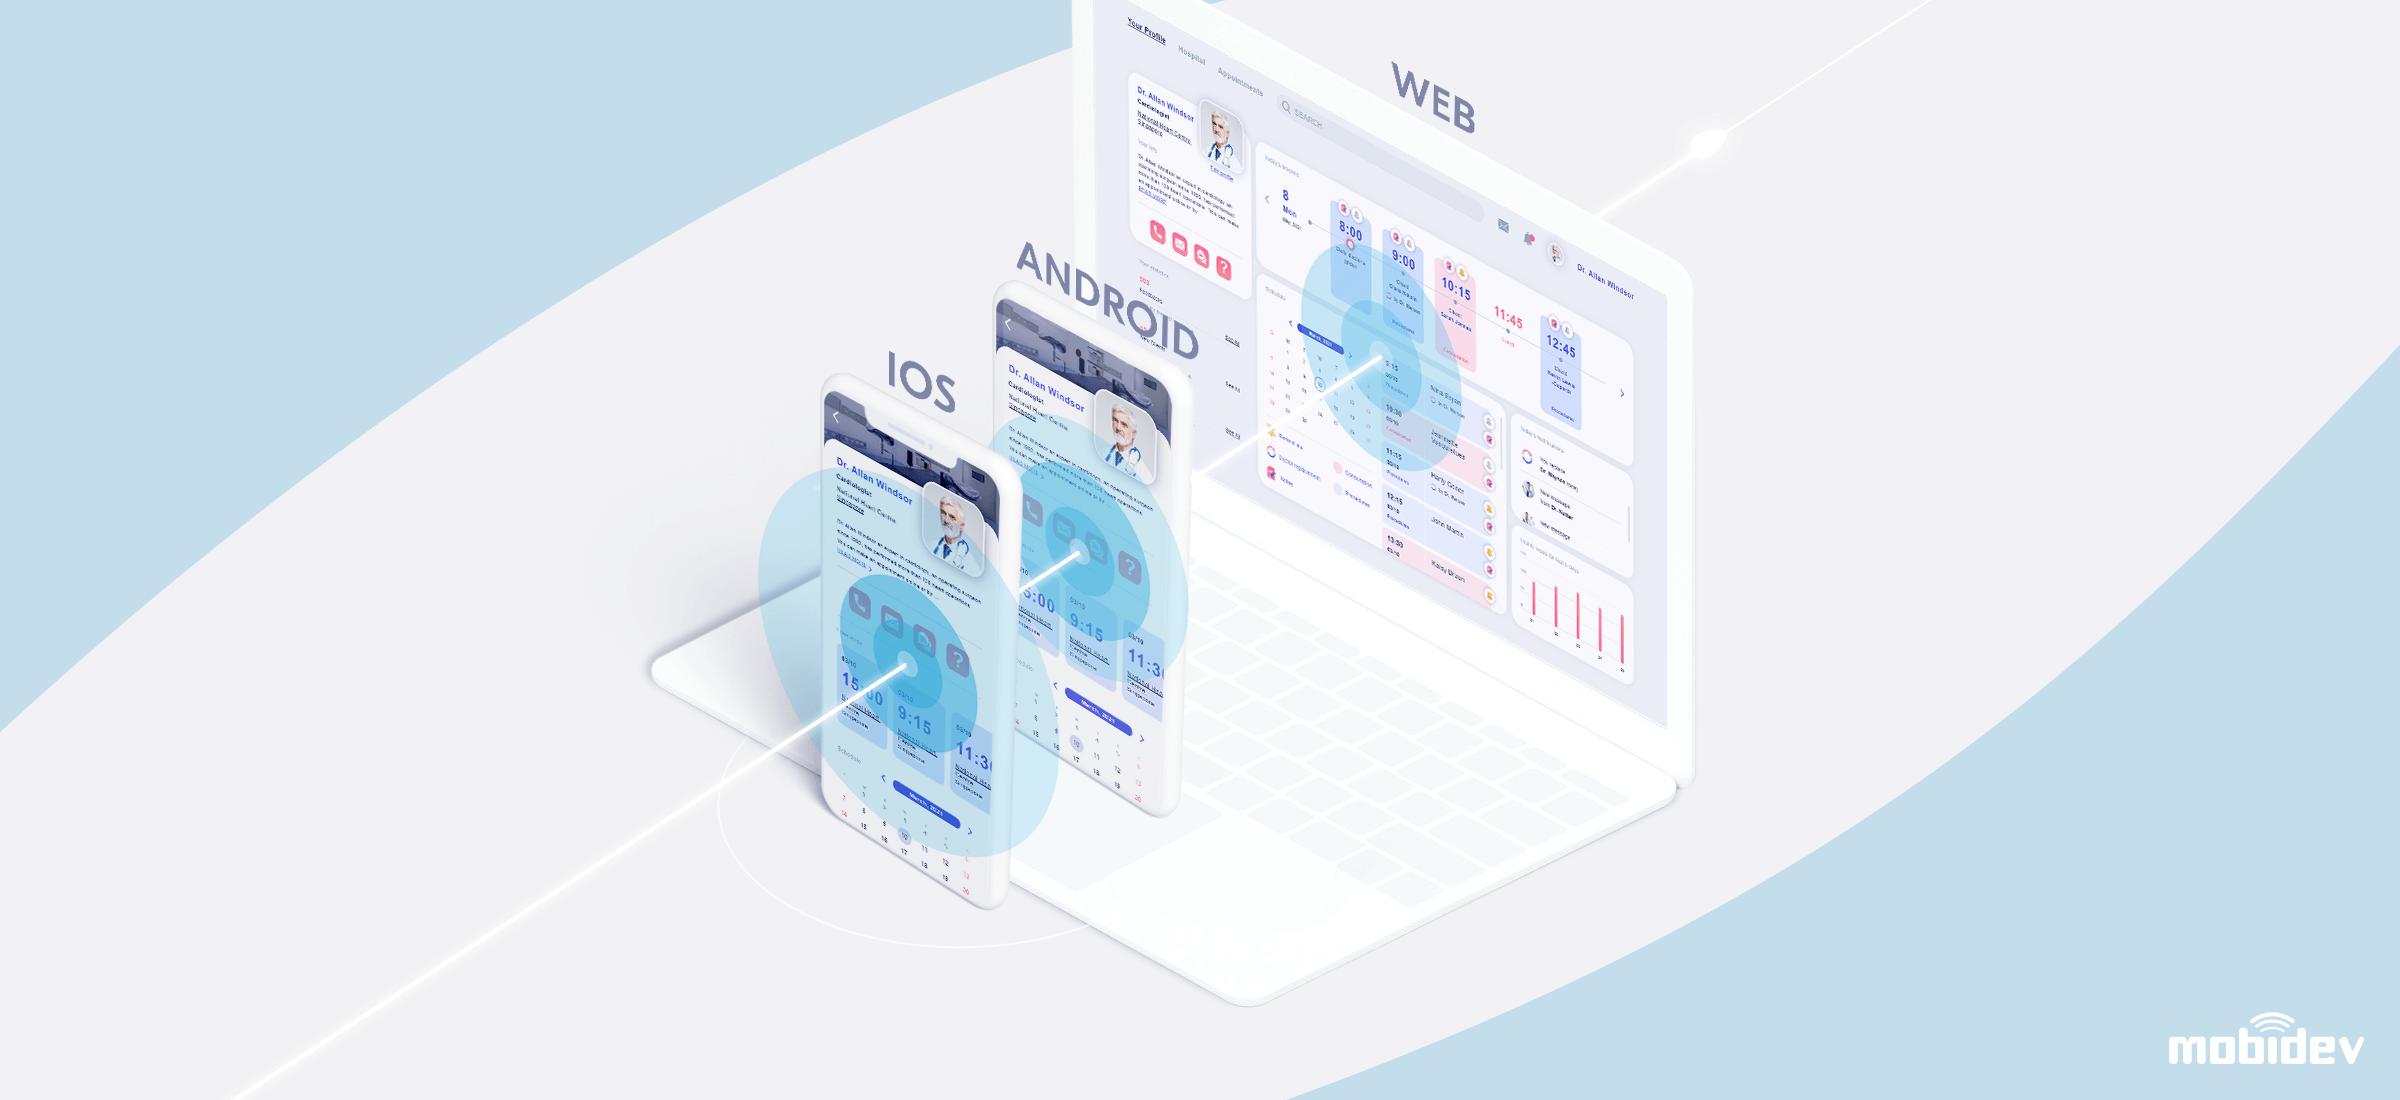 Why Choose Flutter For Cross-Platform App Development in 2020